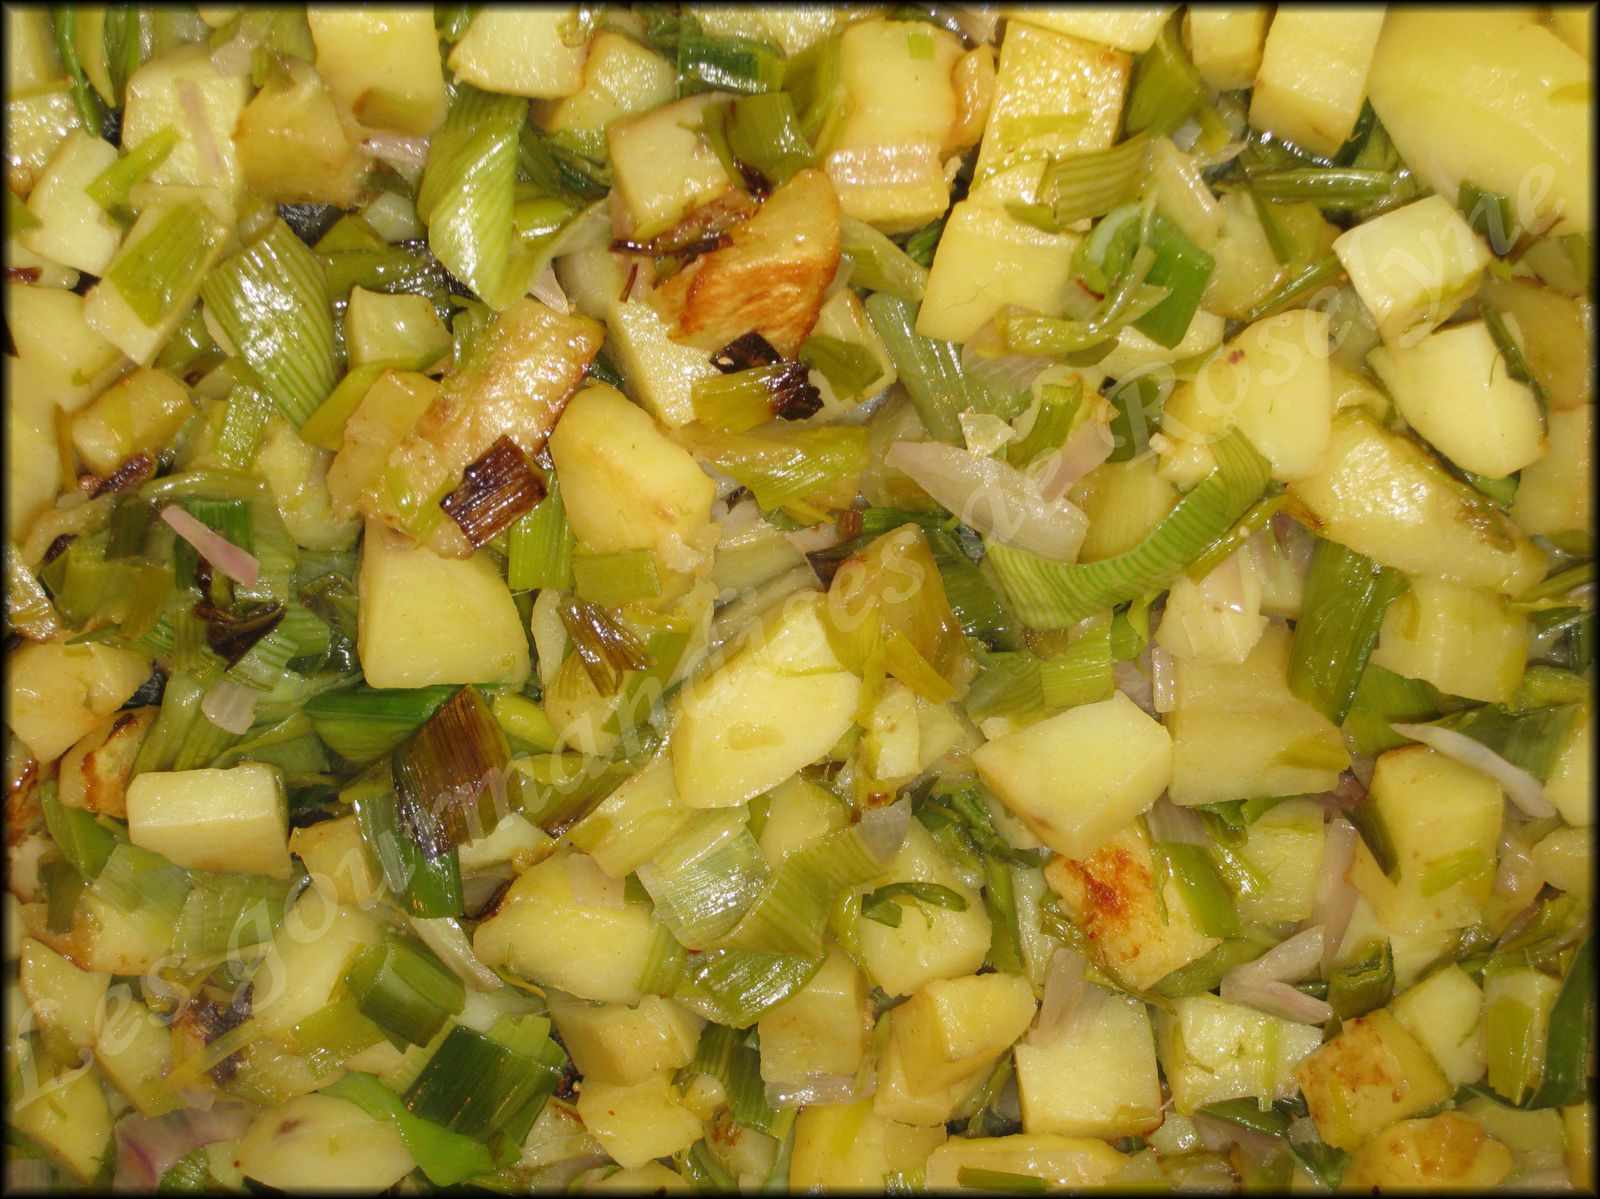 Tarte poireaux pommes de terre